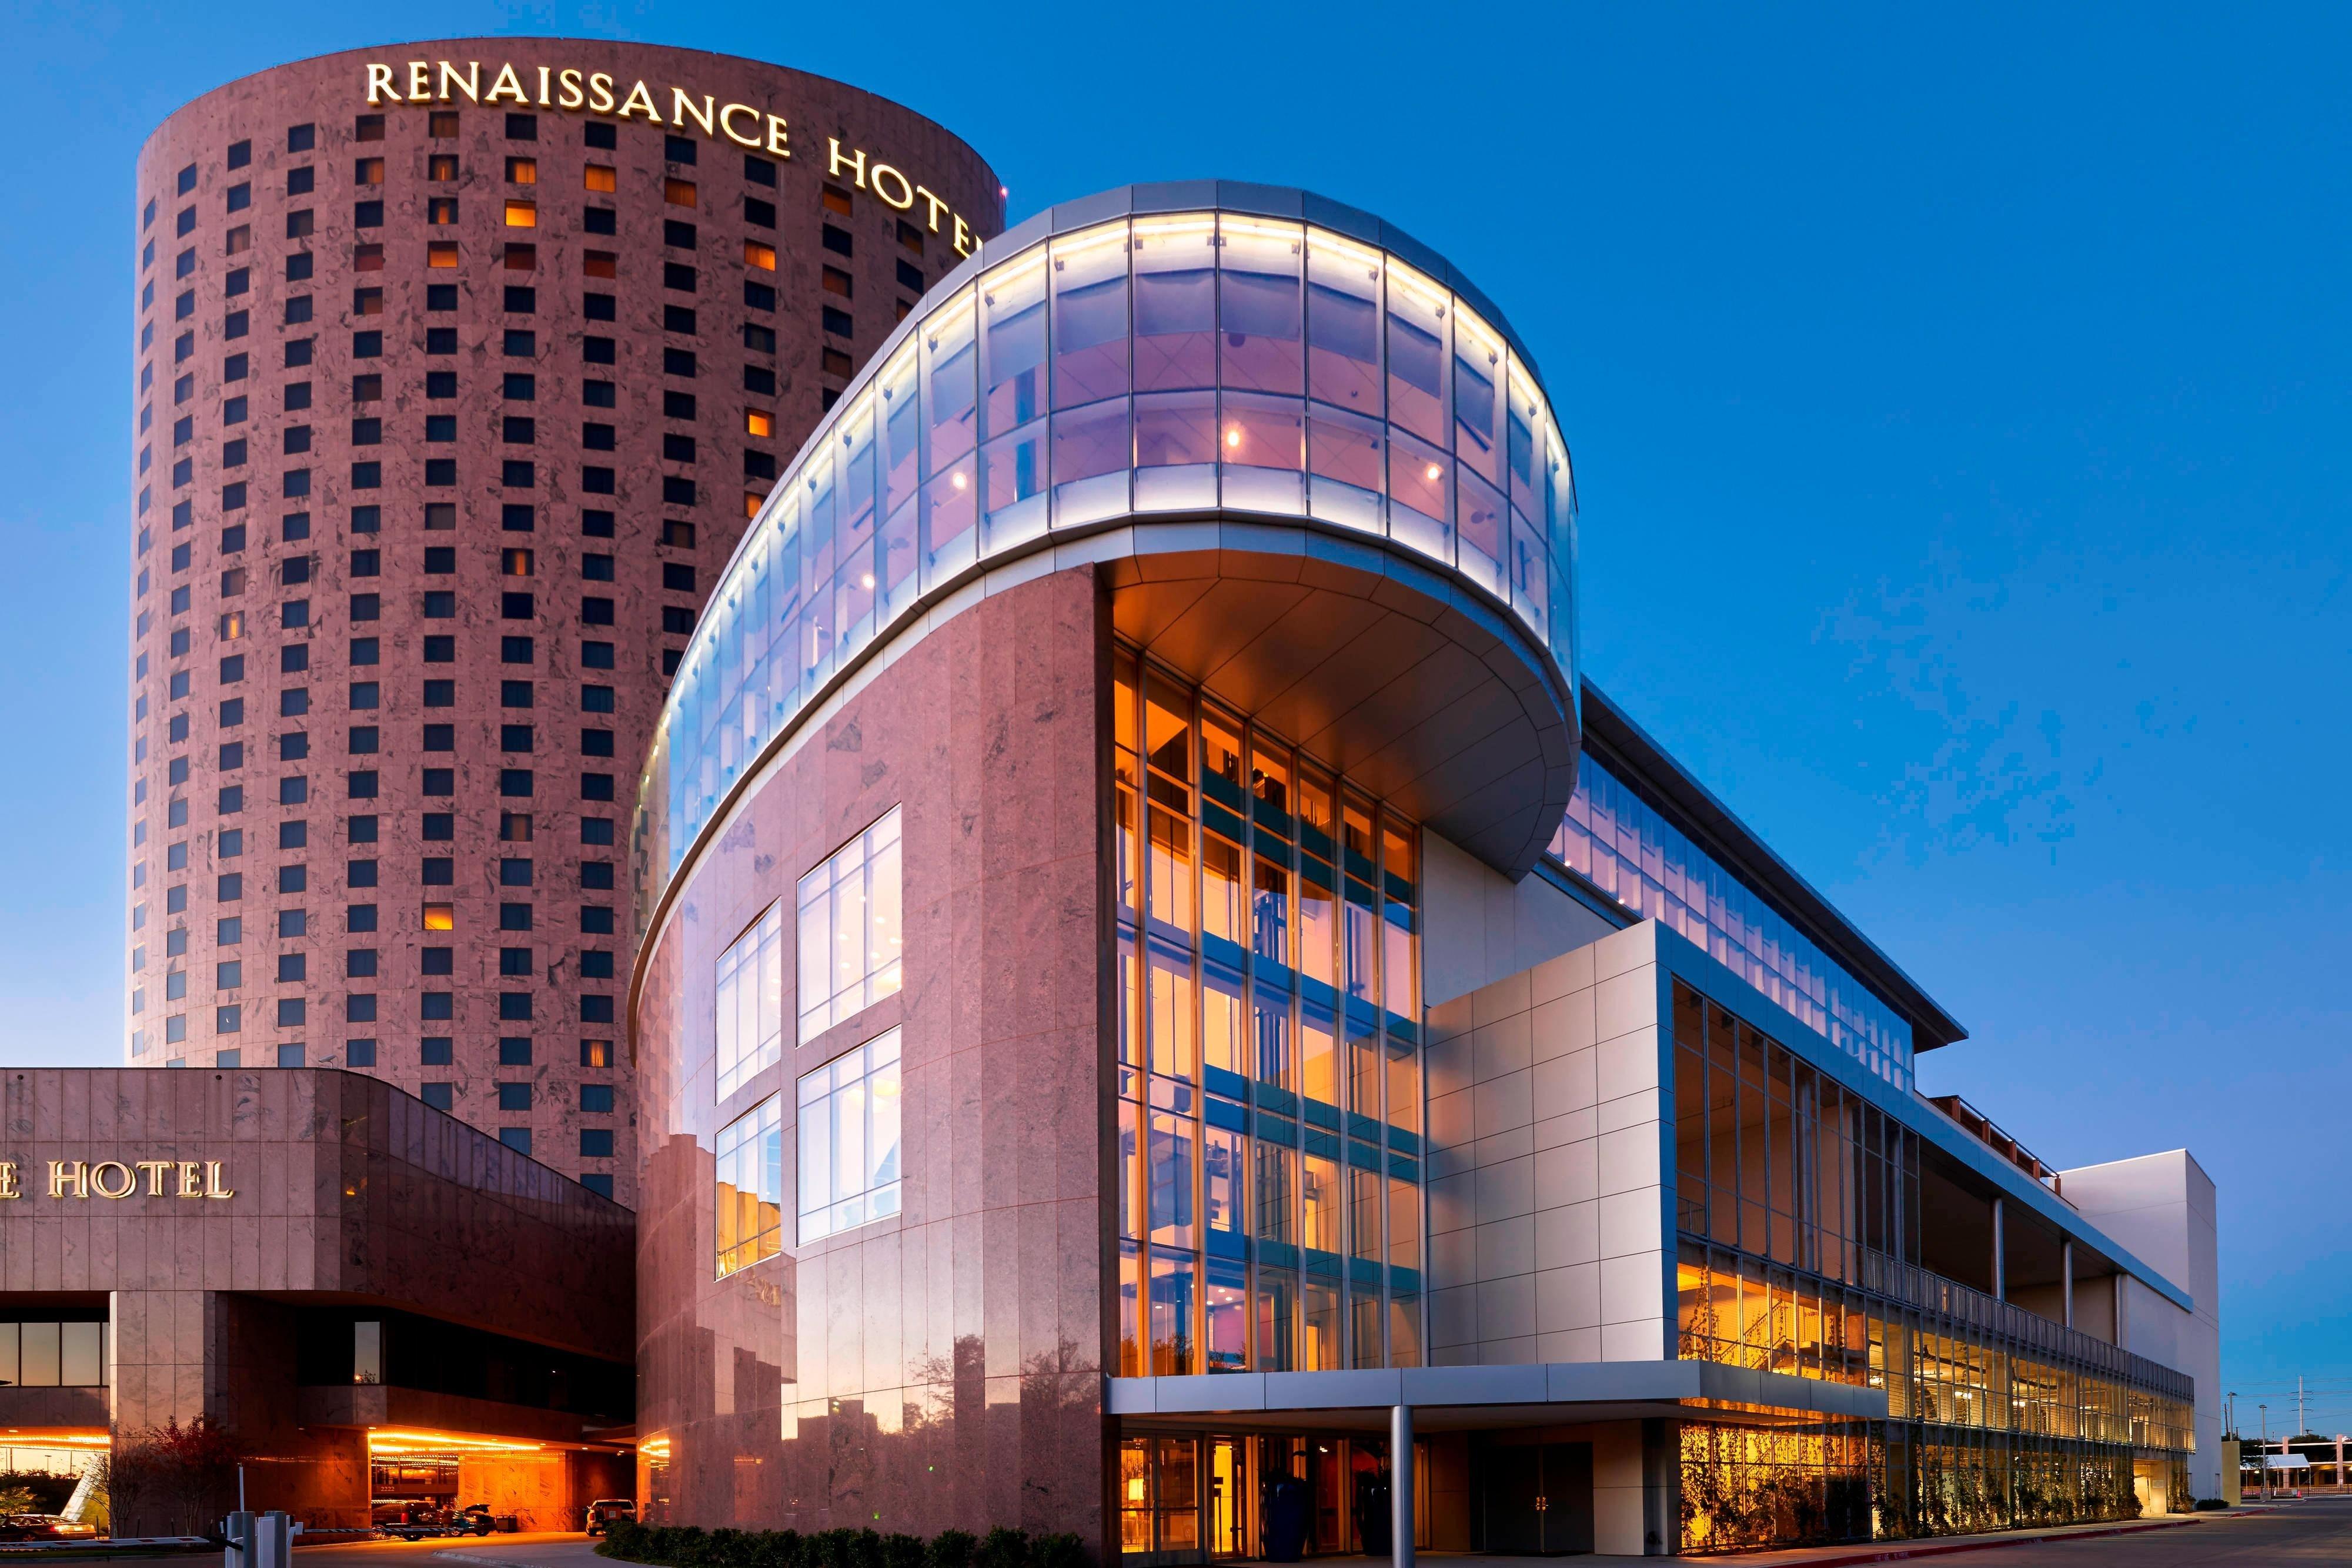 Renaissance Dallas Hotel